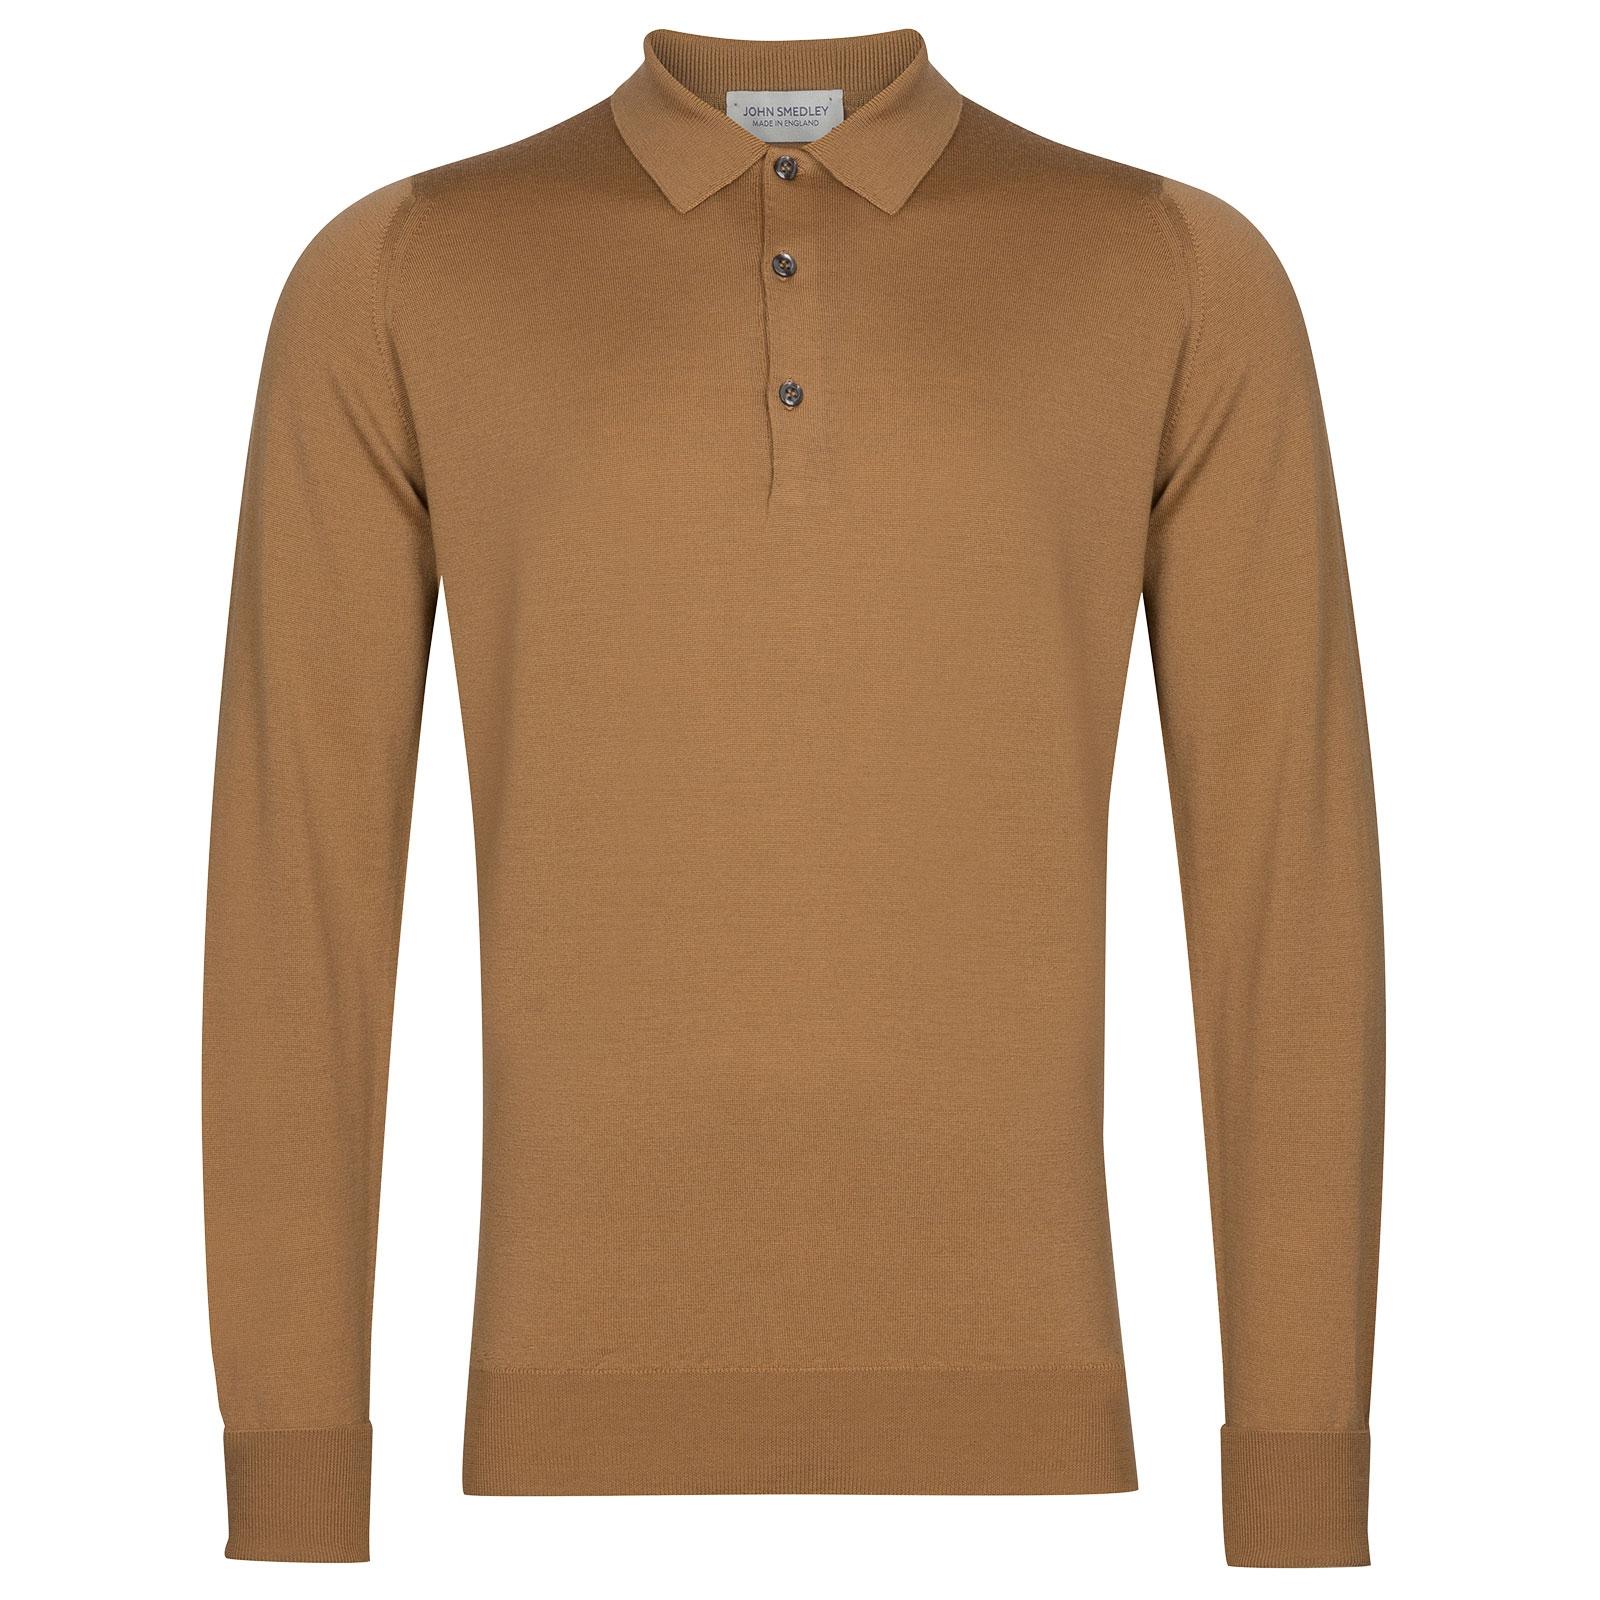 John Smedley Cotswold in Camel Shirt-LGE